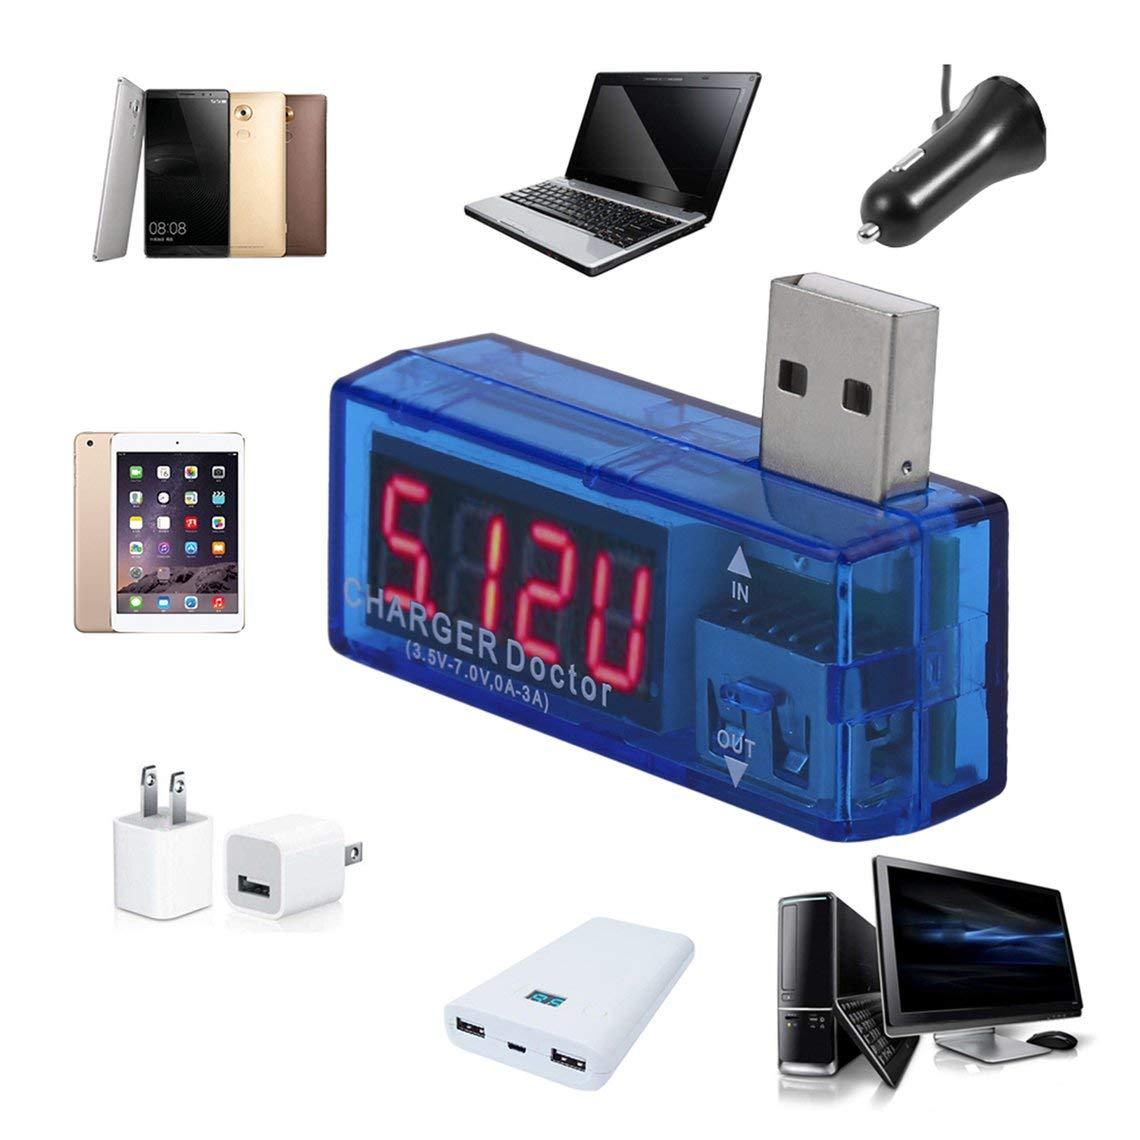 Zinniaya 3.5V-7.0V Volt/ímetro Amper/ímetro USB Probador de Capacidad de Fuente de alimentaci/ón m/óvil Detecci/ón de Capacidad de Fuente de alimentaci/ón